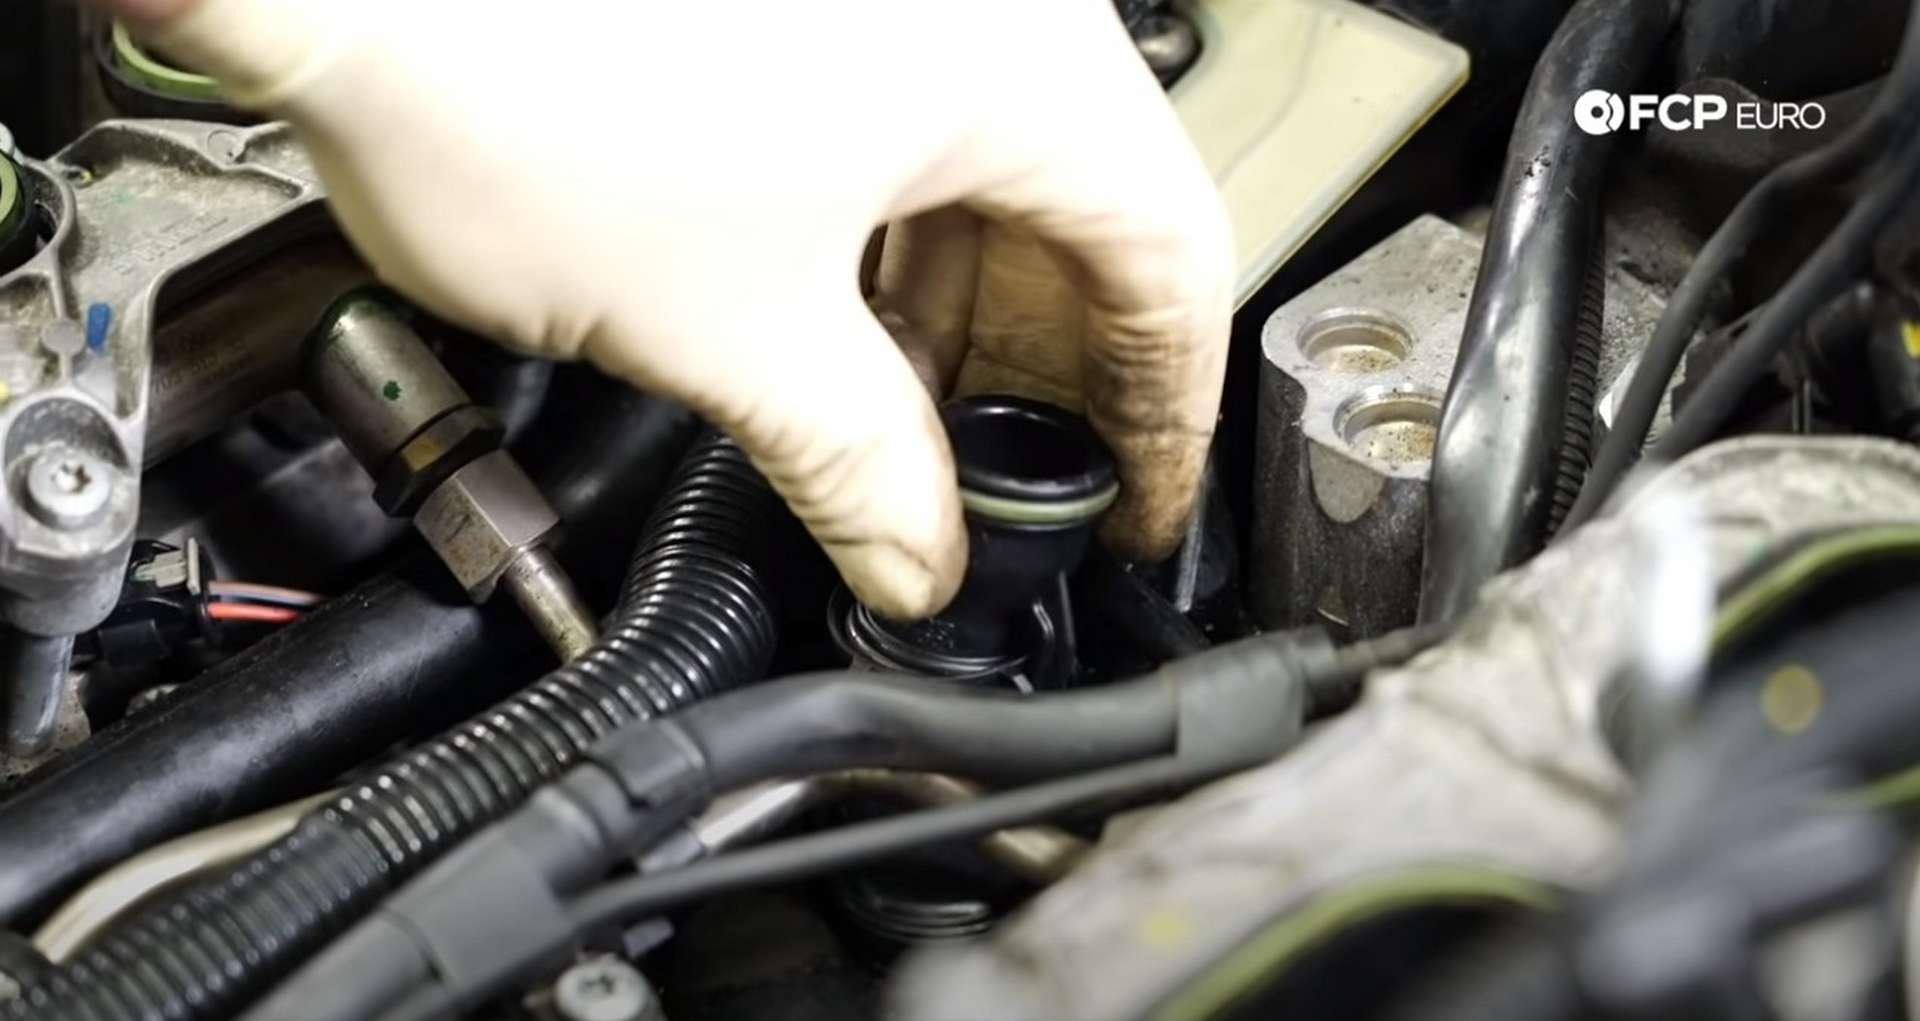 DIY Audi 3.0t Walnut Blasting Intake Valves installing the new breather pipe